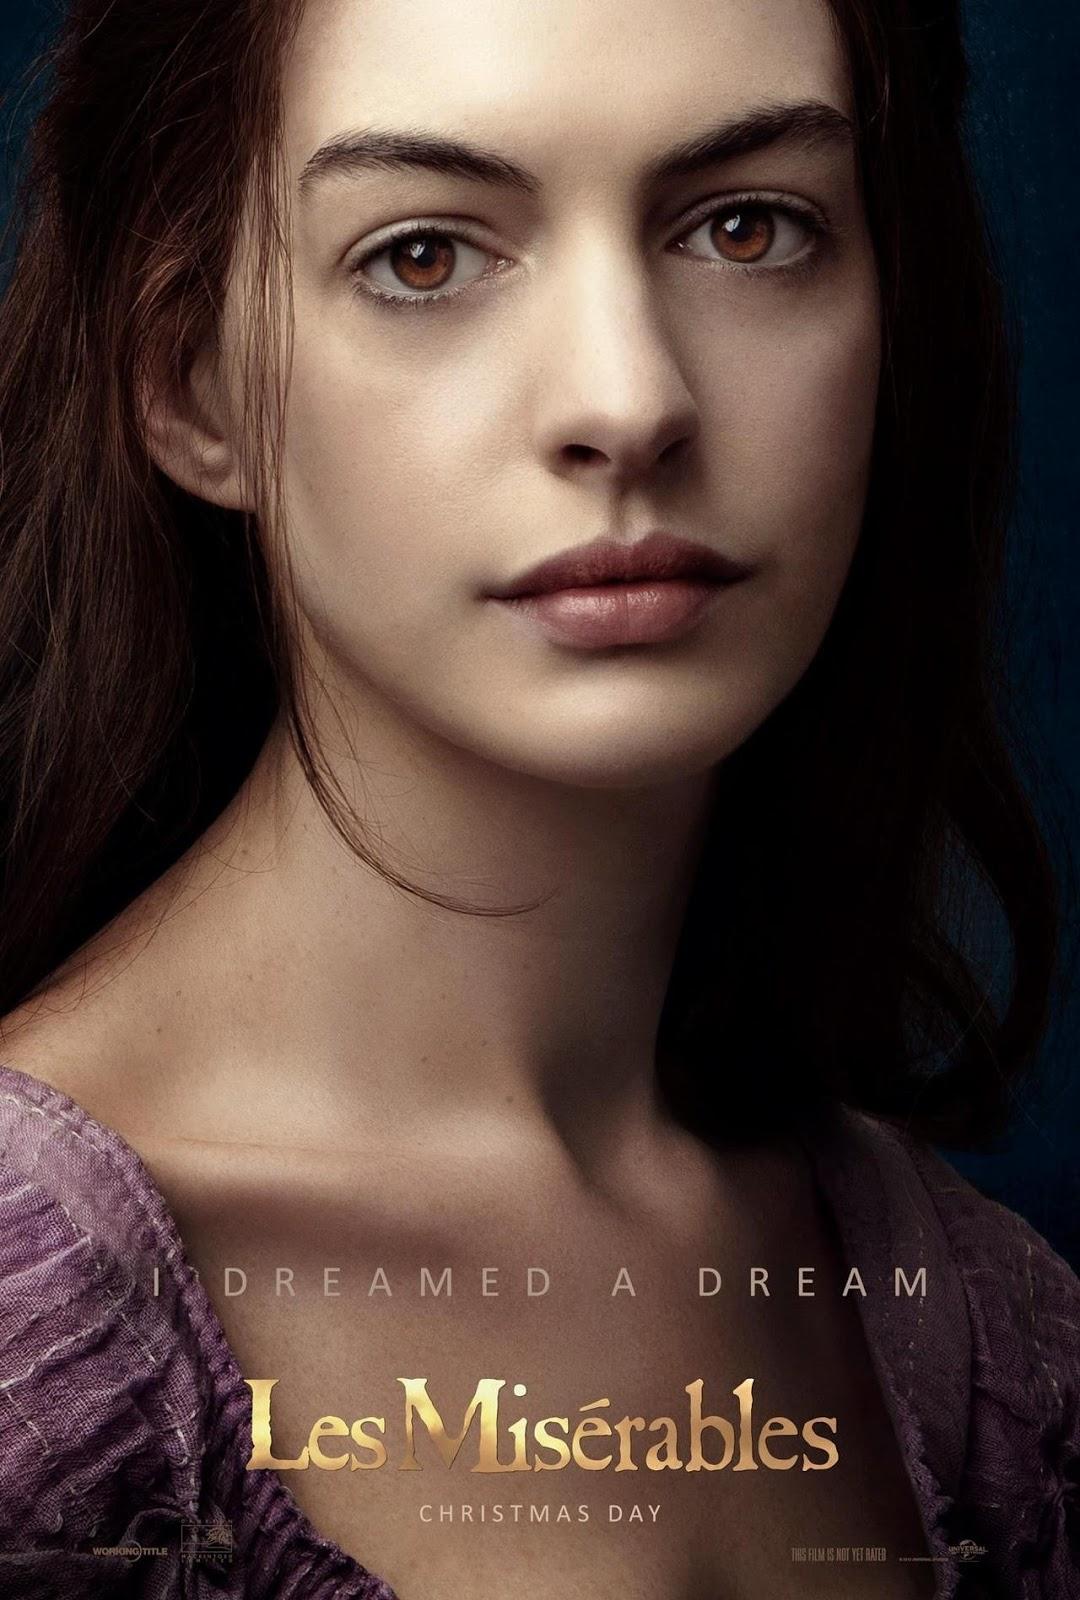 http://1.bp.blogspot.com/--OA4lS-FJ3s/UN9kaHeLwsI/AAAAAAAAAco/GwwRCAgJv34/s1600/i_dreamed_a_dream_anne_hathaway_poster.jpg